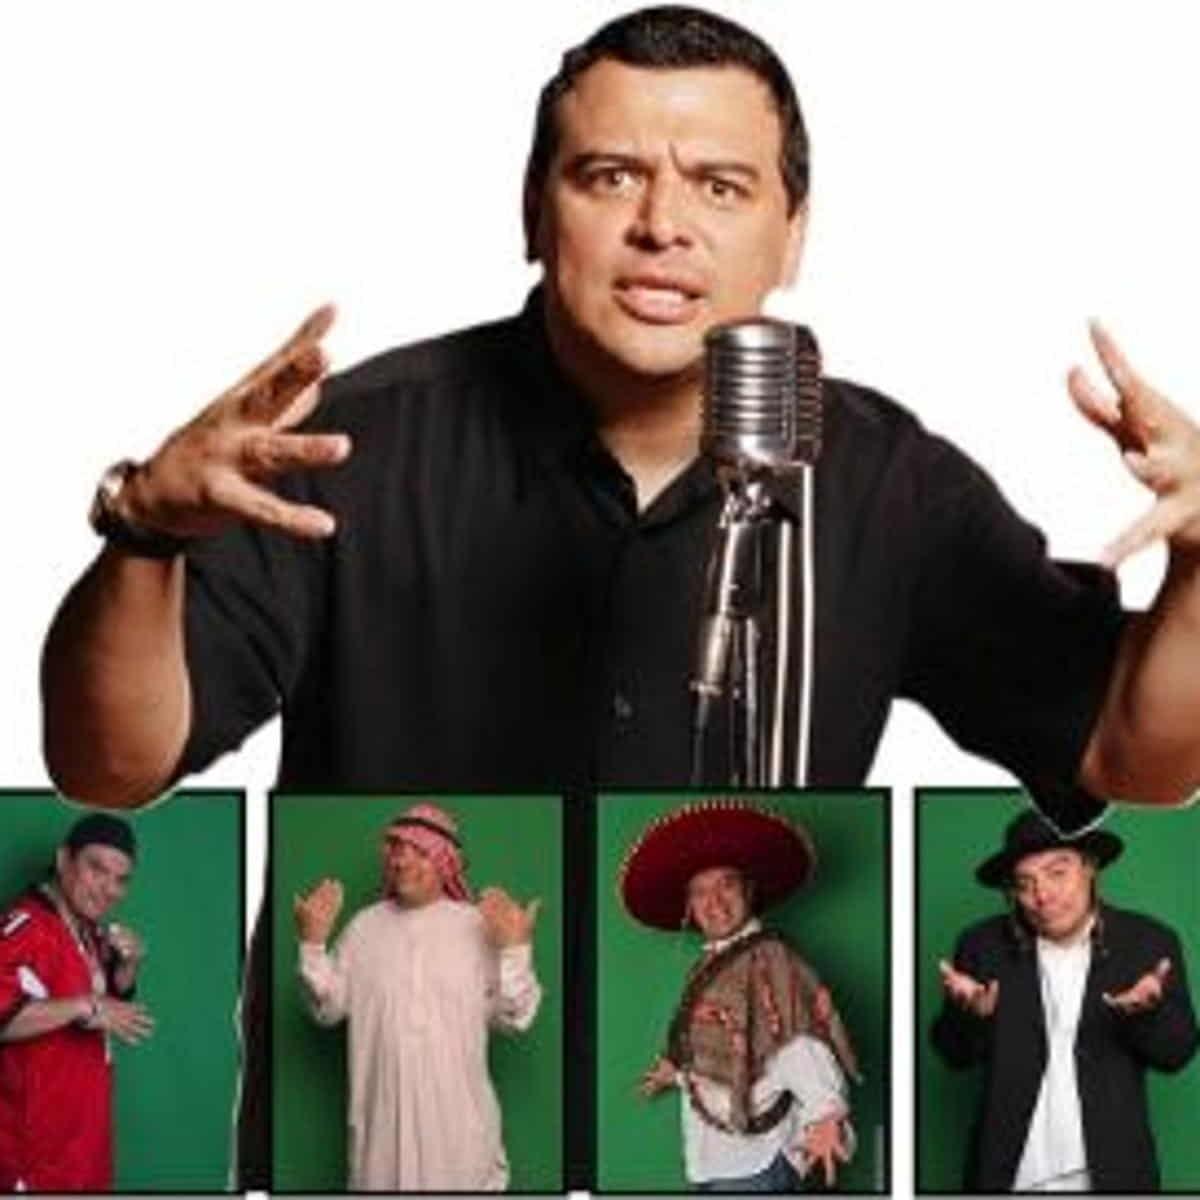 Life History of Carlos Mencia